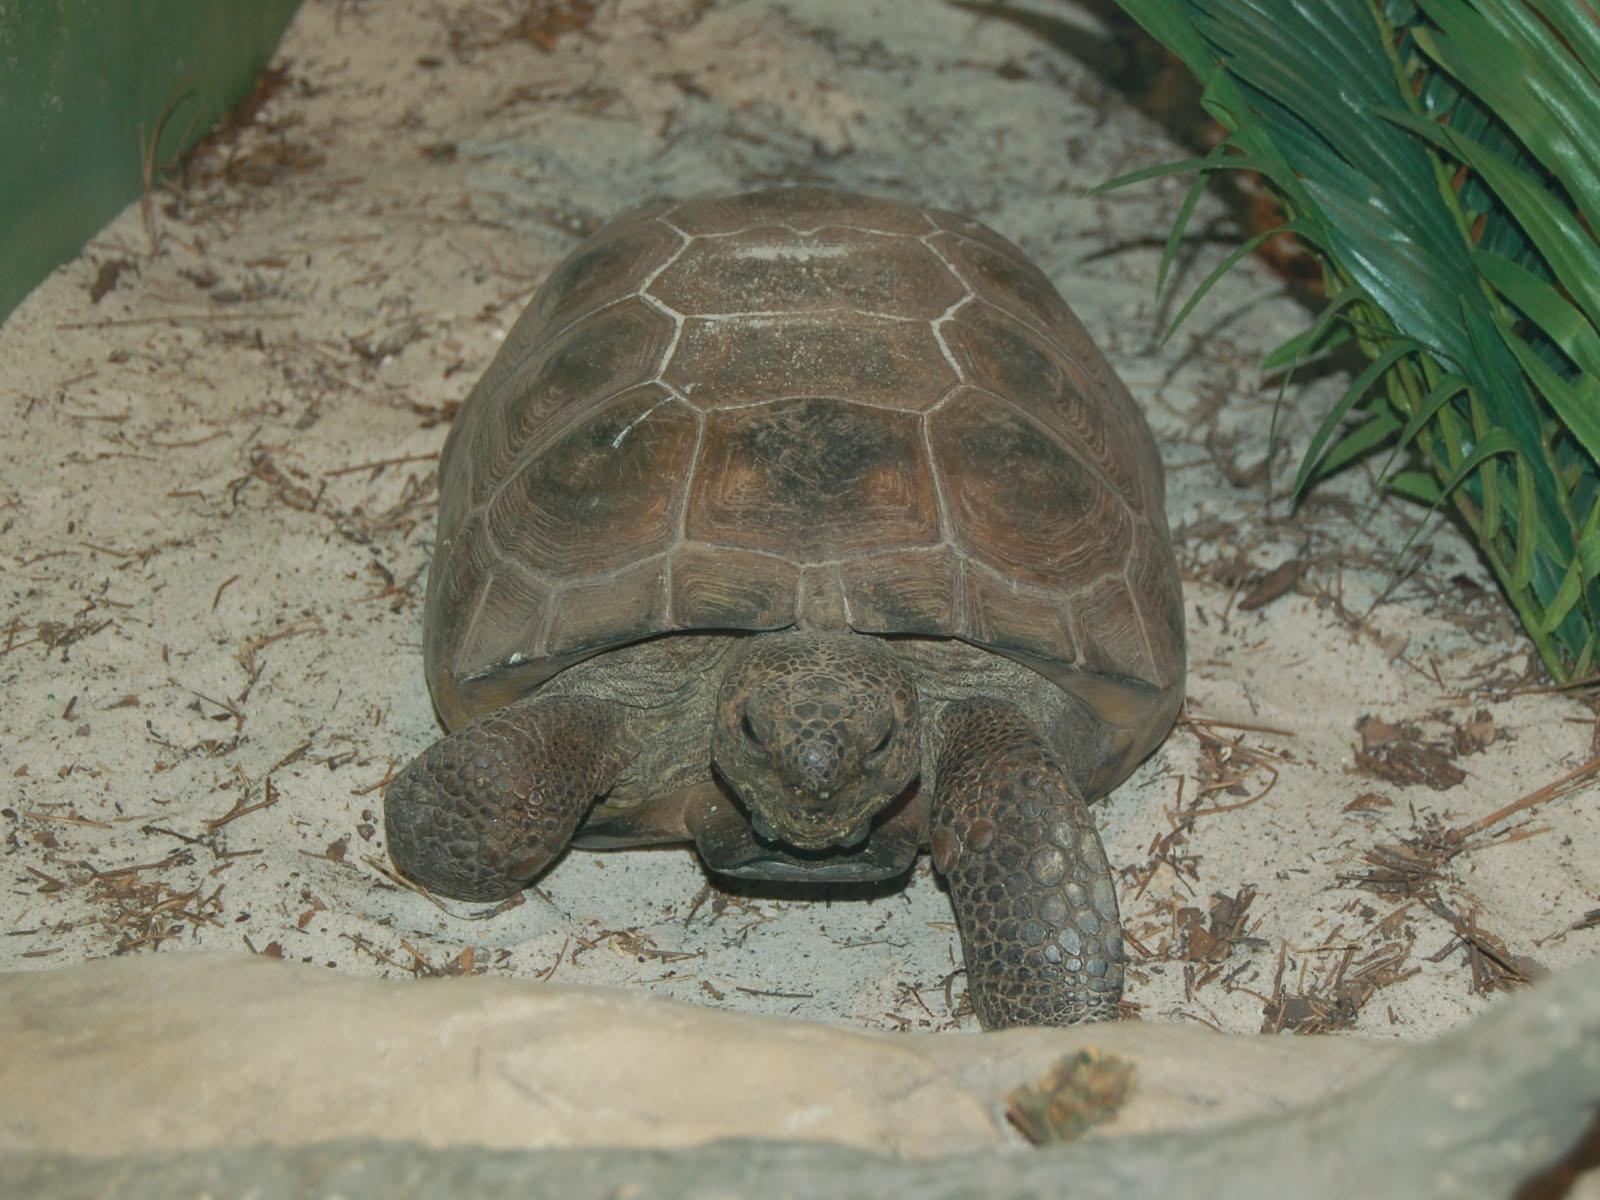 The Online Zoo Gopher Tortoise